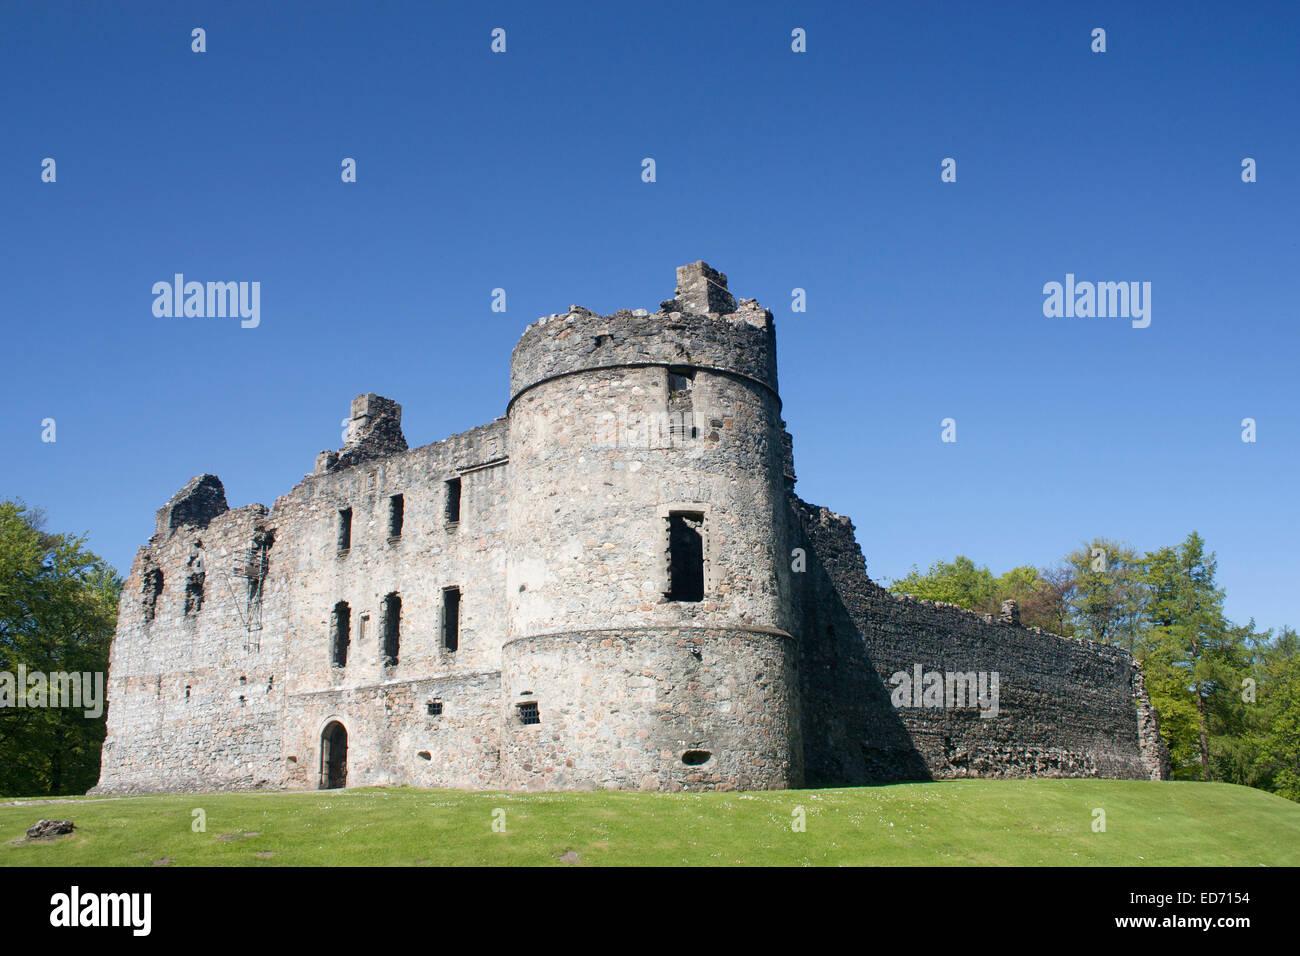 United Kingdom, Scotland, Grampian, near Dufftown, Balvenie Castle ruins - Stock Image